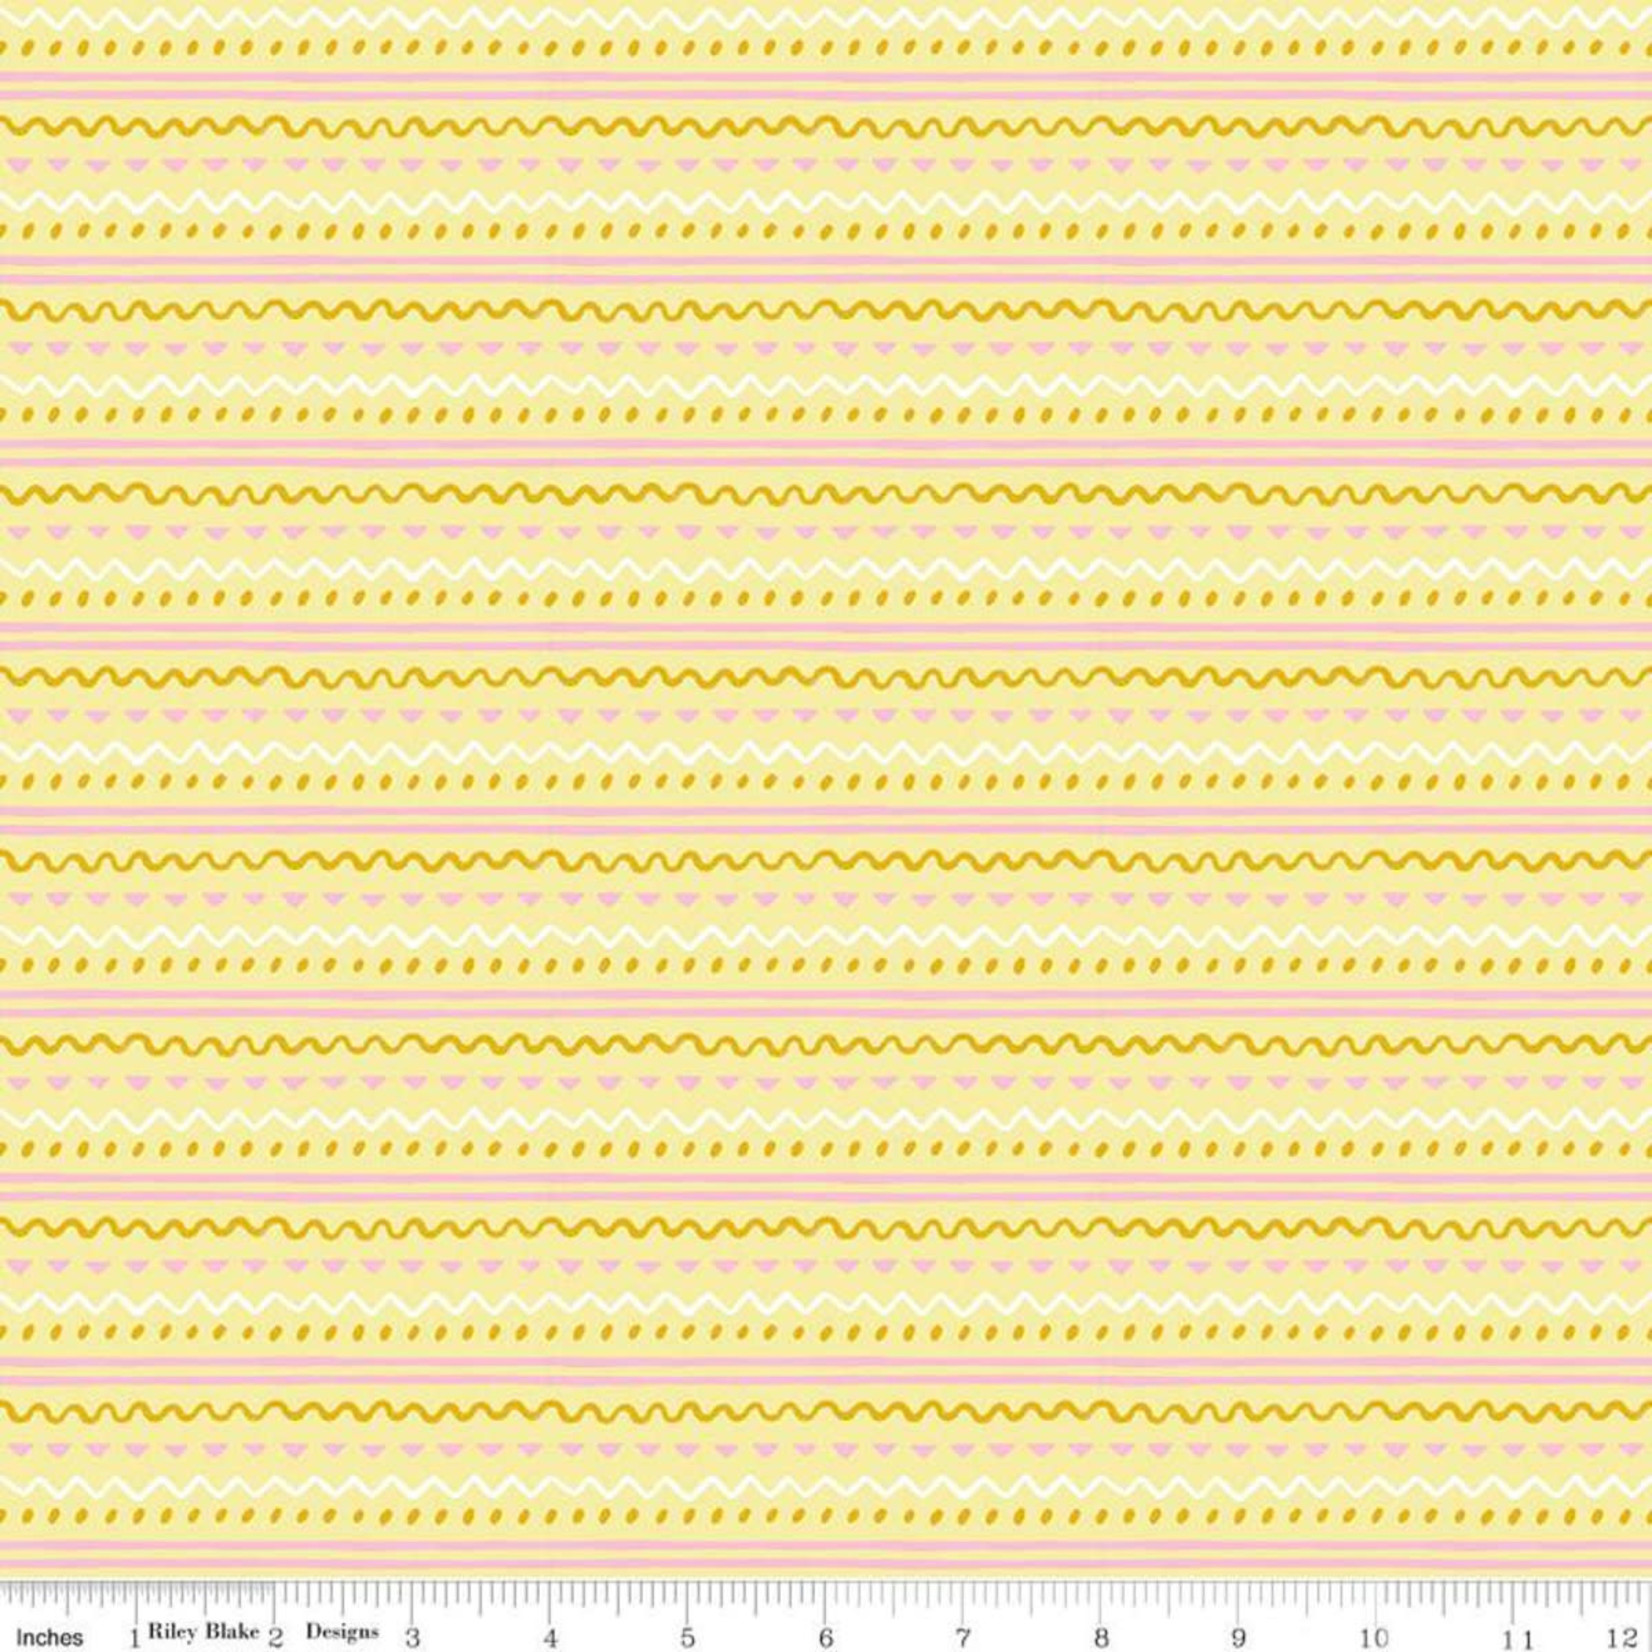 RILEY BLAKE DESIGNS Easter Egg Hunt, Geo Stripe, Yellow $0.20 per cm or $20/m